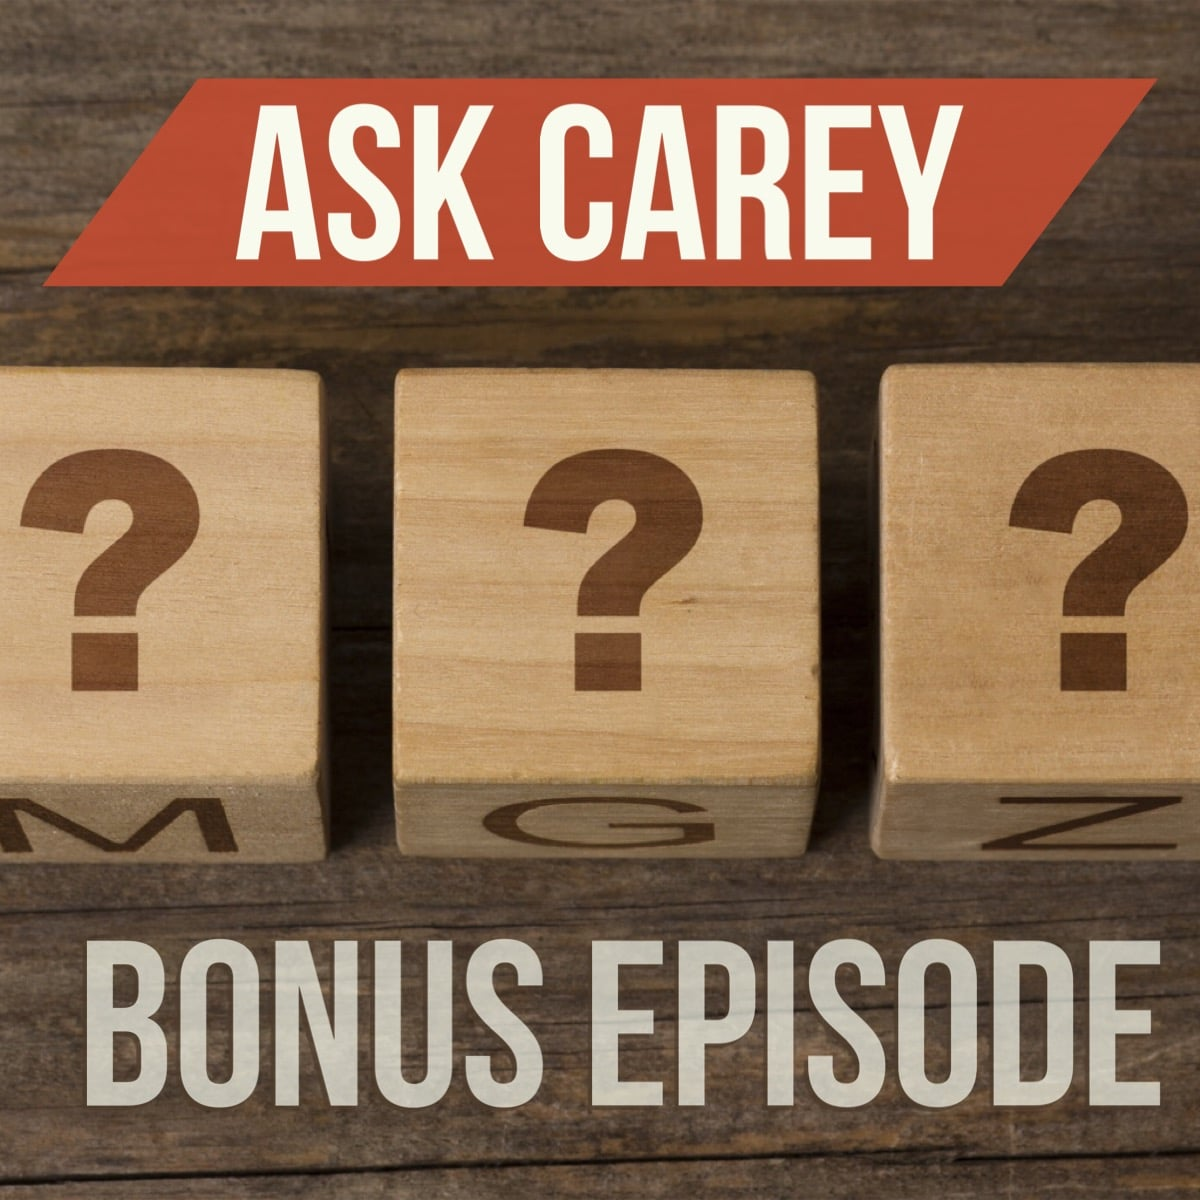 CNLP Bonus 005: #AskCarey Part 4